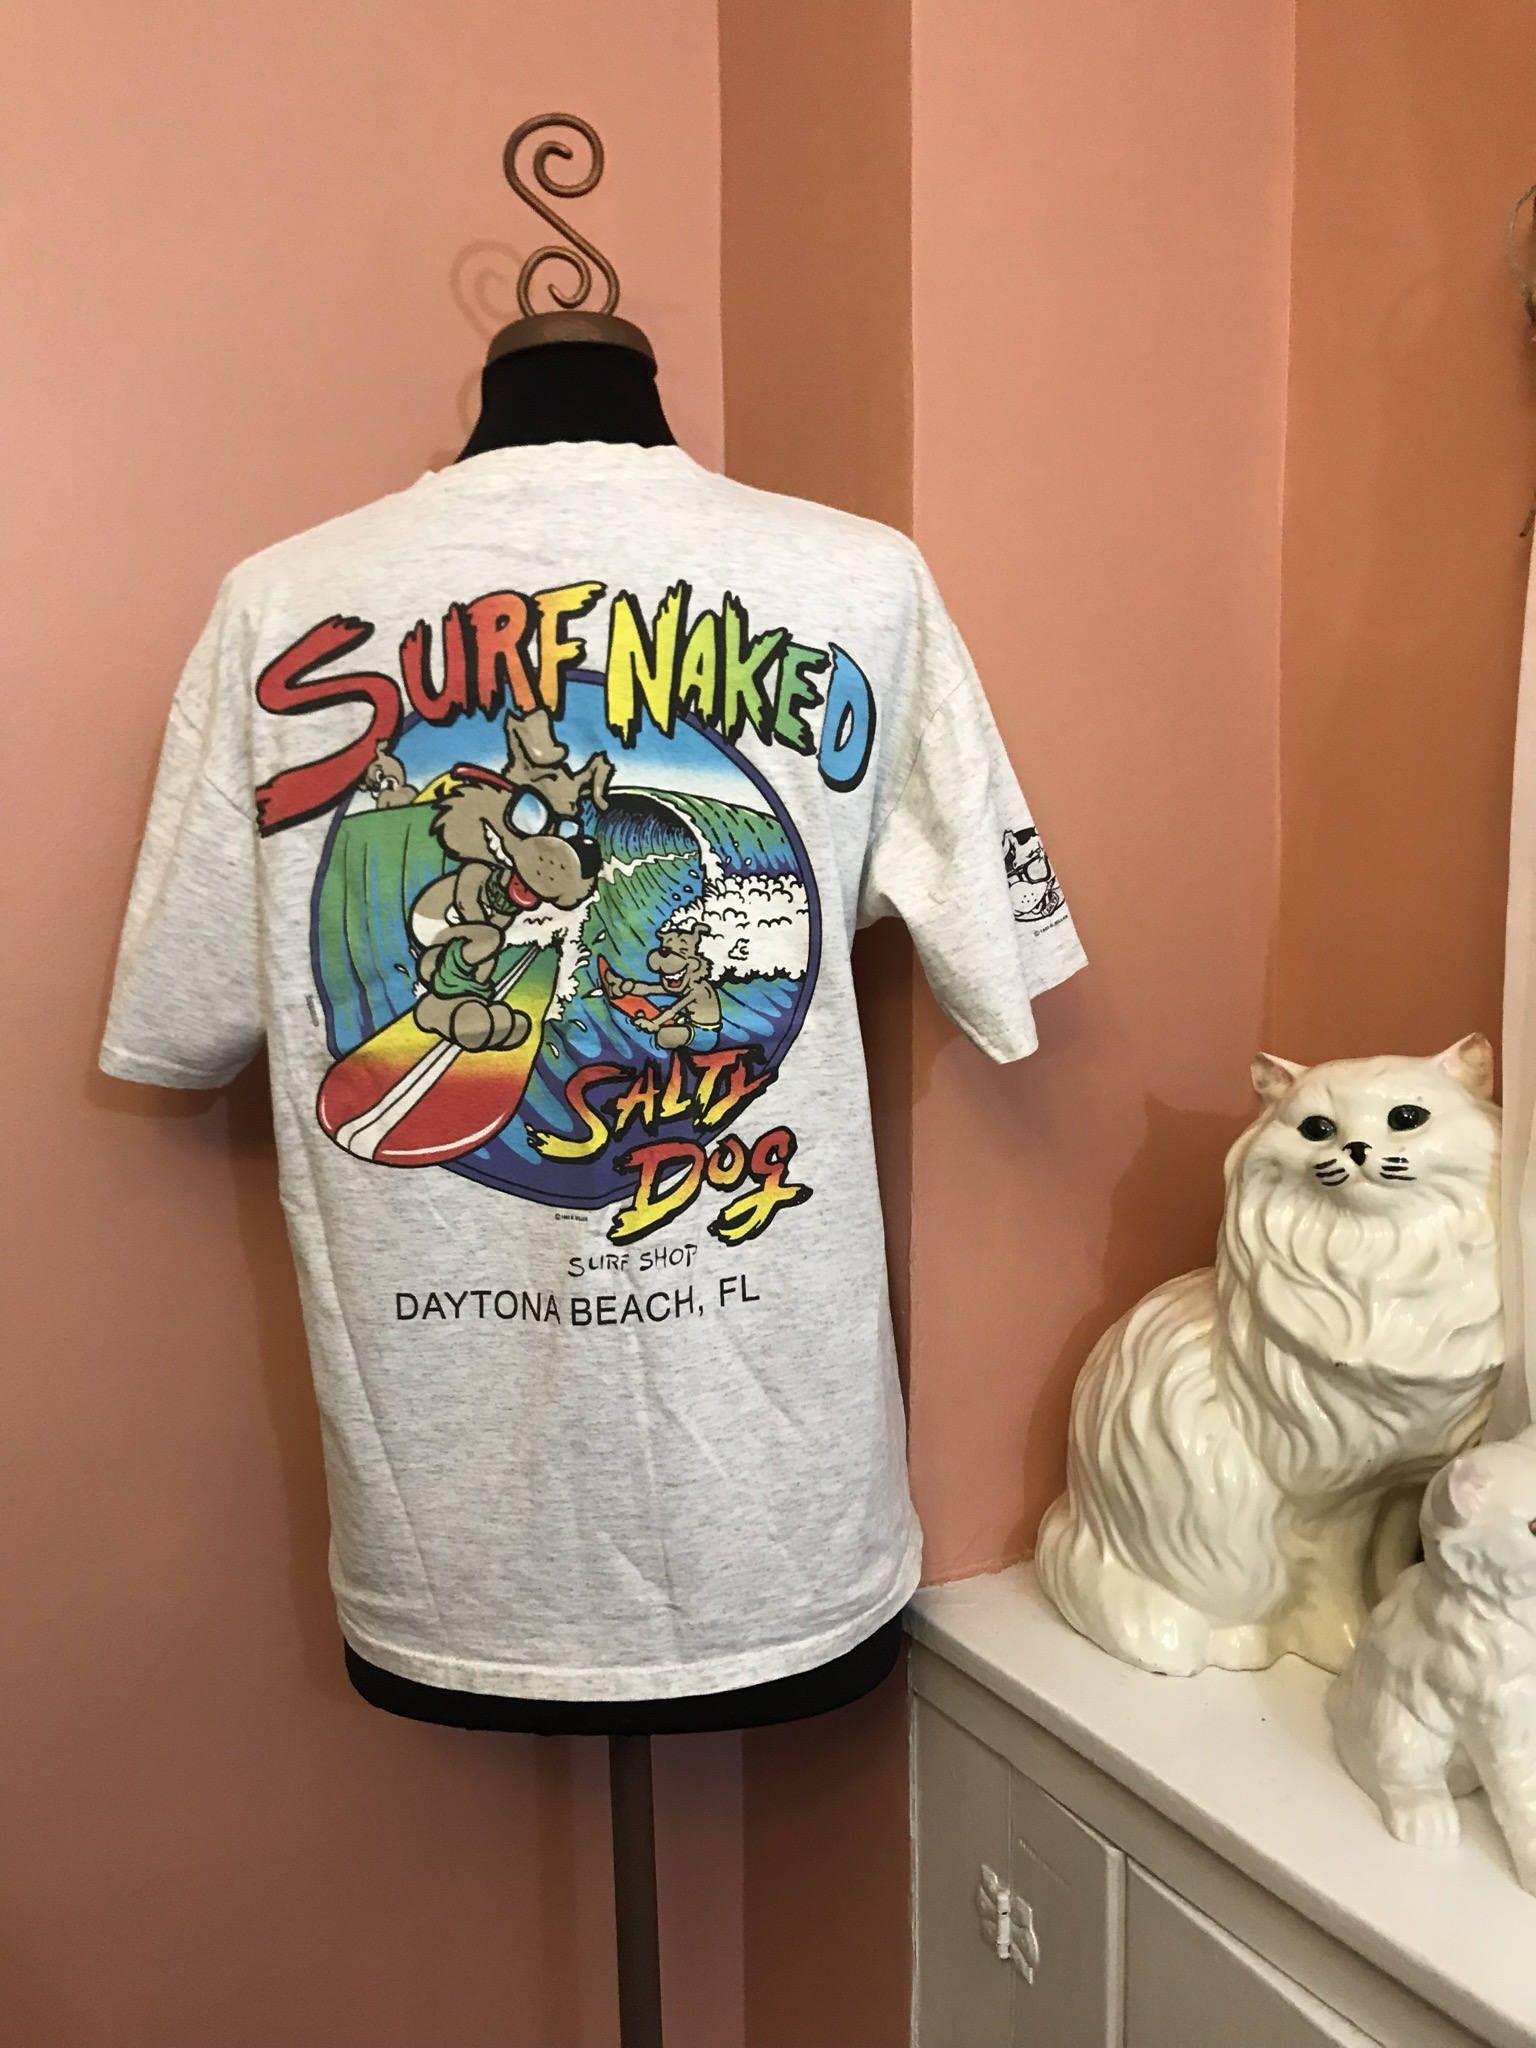 2777e5ed0 Vintage 90s TShirt, Daytona Beach, Spring Break, Salty Dog, Surf Naked, Surf  Shop, Surfer, Skater, Beach Bum, M (B380)